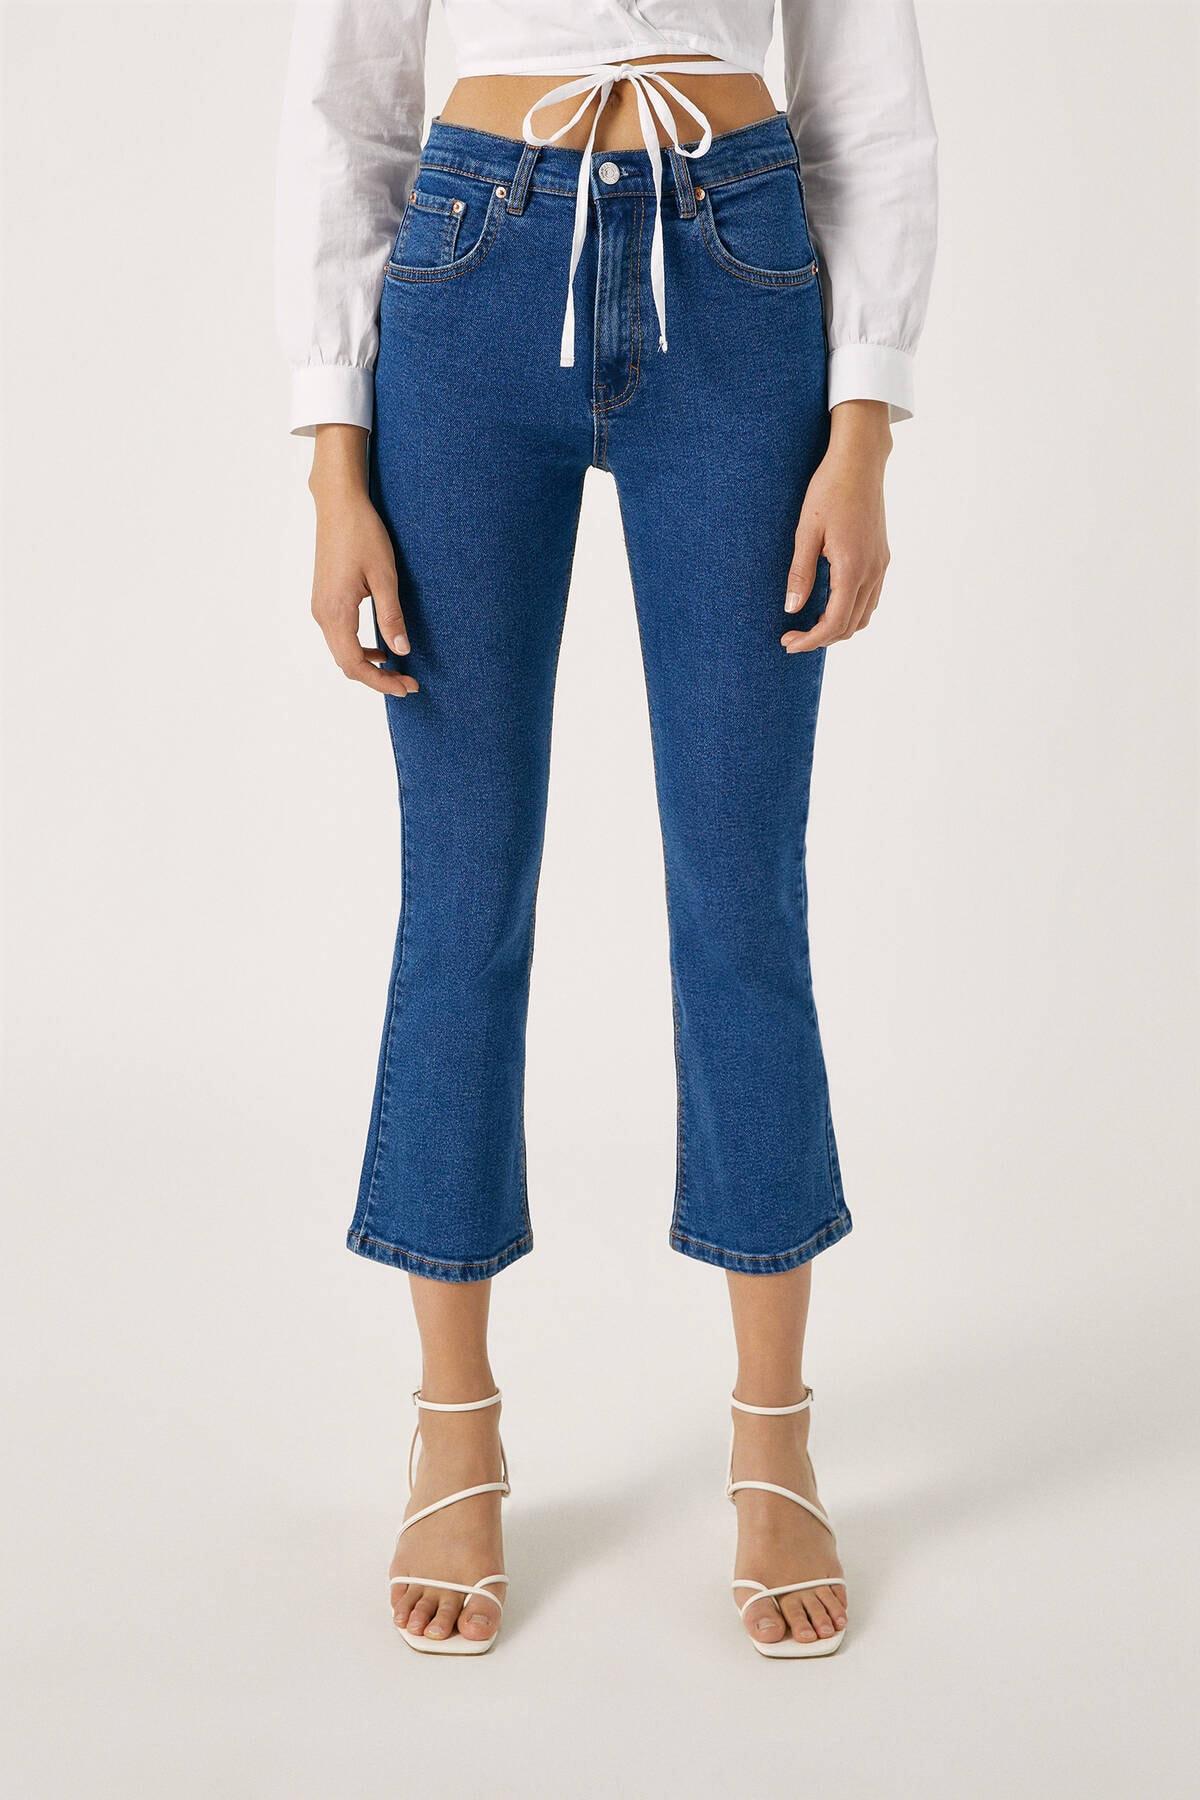 Pull & Bear Kadın Mavi Basic İspanyol Paça Jean 09683310 2